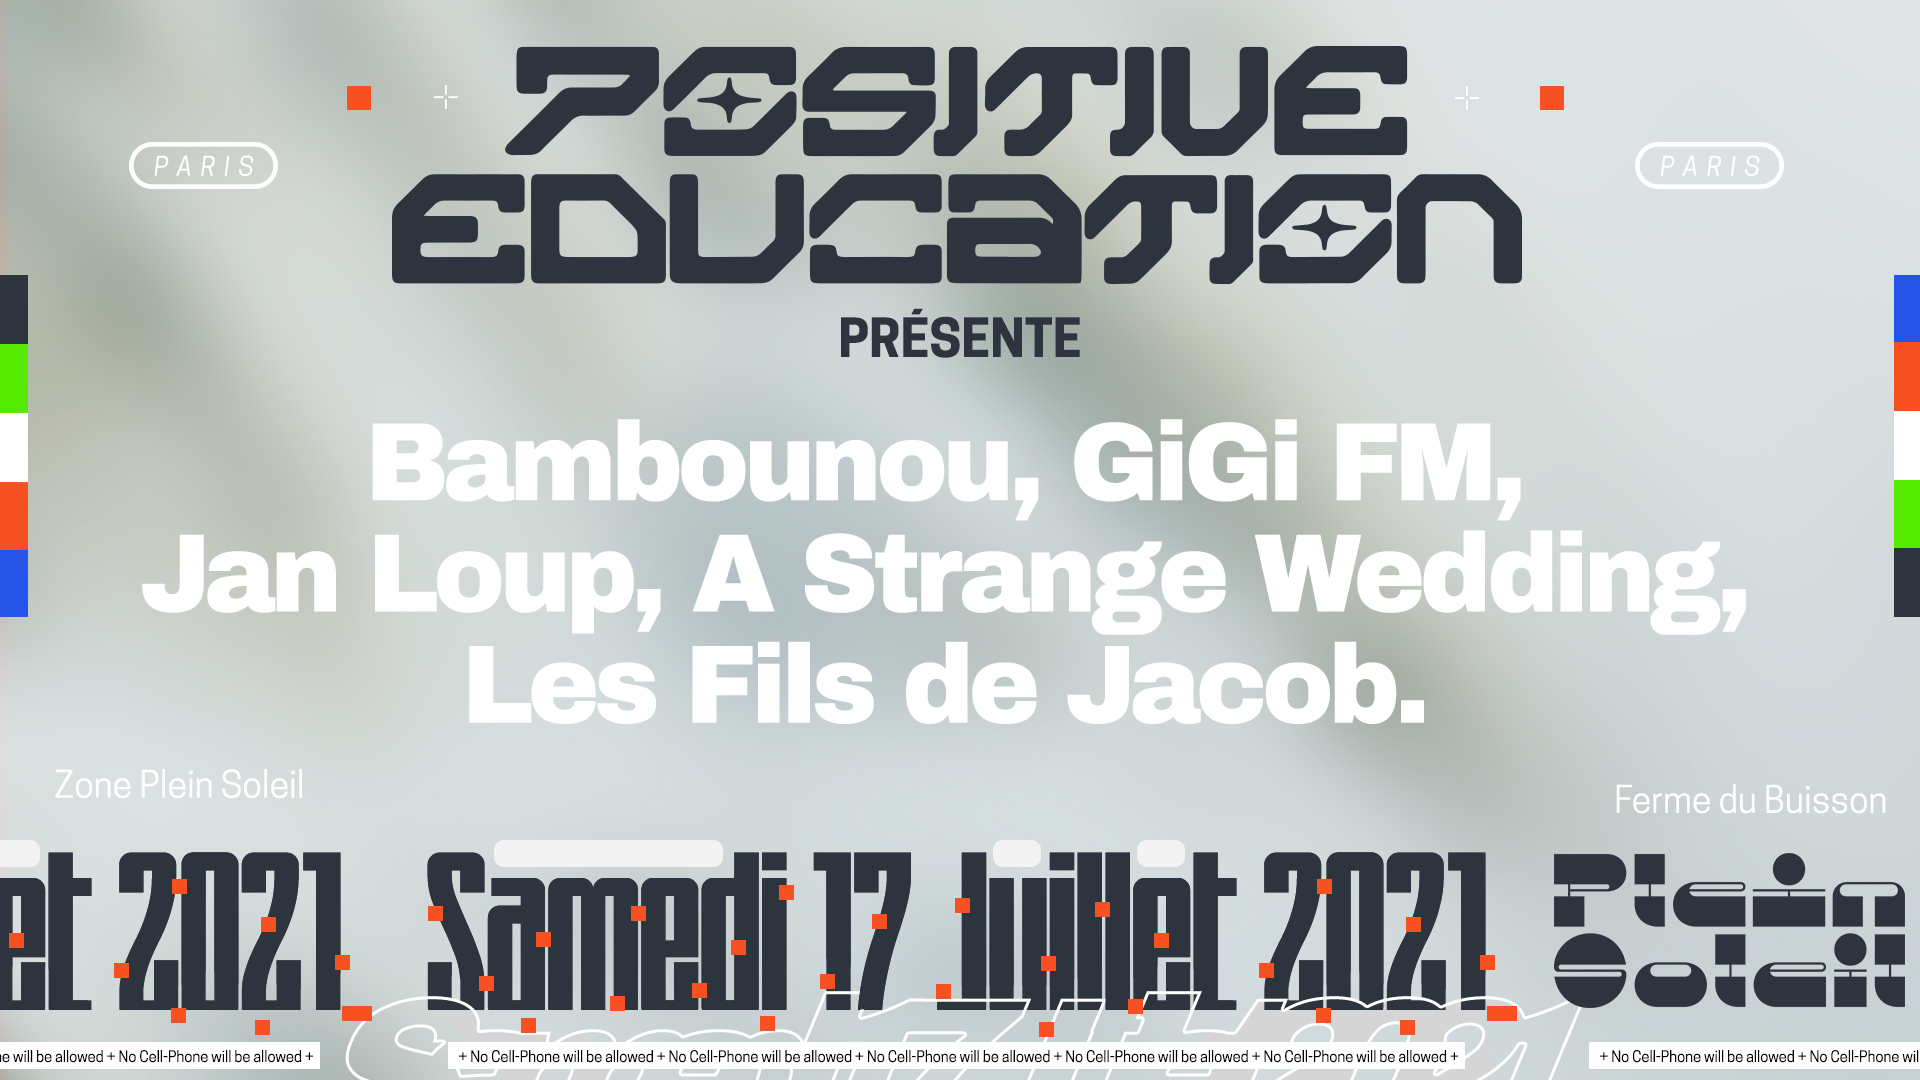 ℙ𝕝𝕖𝕚𝕟 𝕊𝕠𝕝𝕖𝕚𝕝 • Positive Education